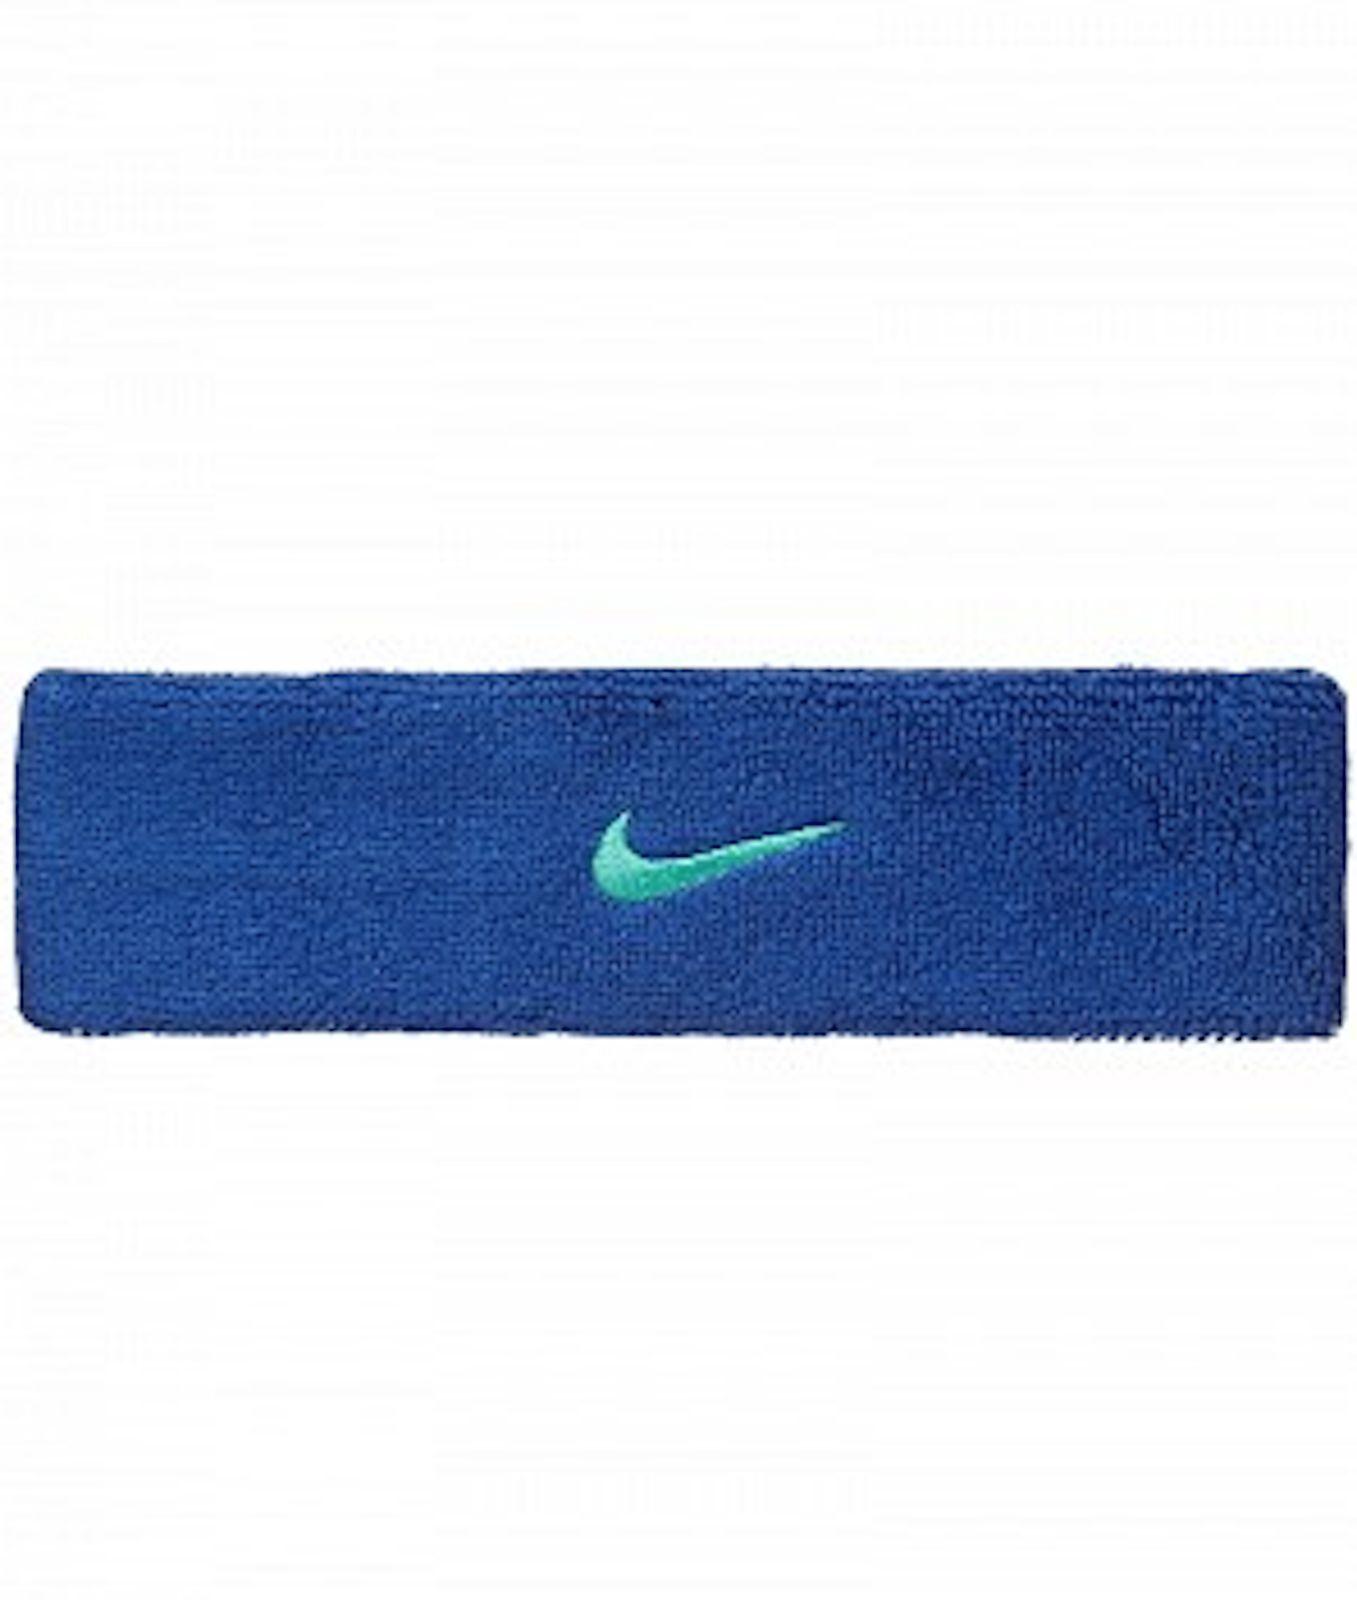 Separar Horror filósofo  NEW Nike Swoosh Headband - 2